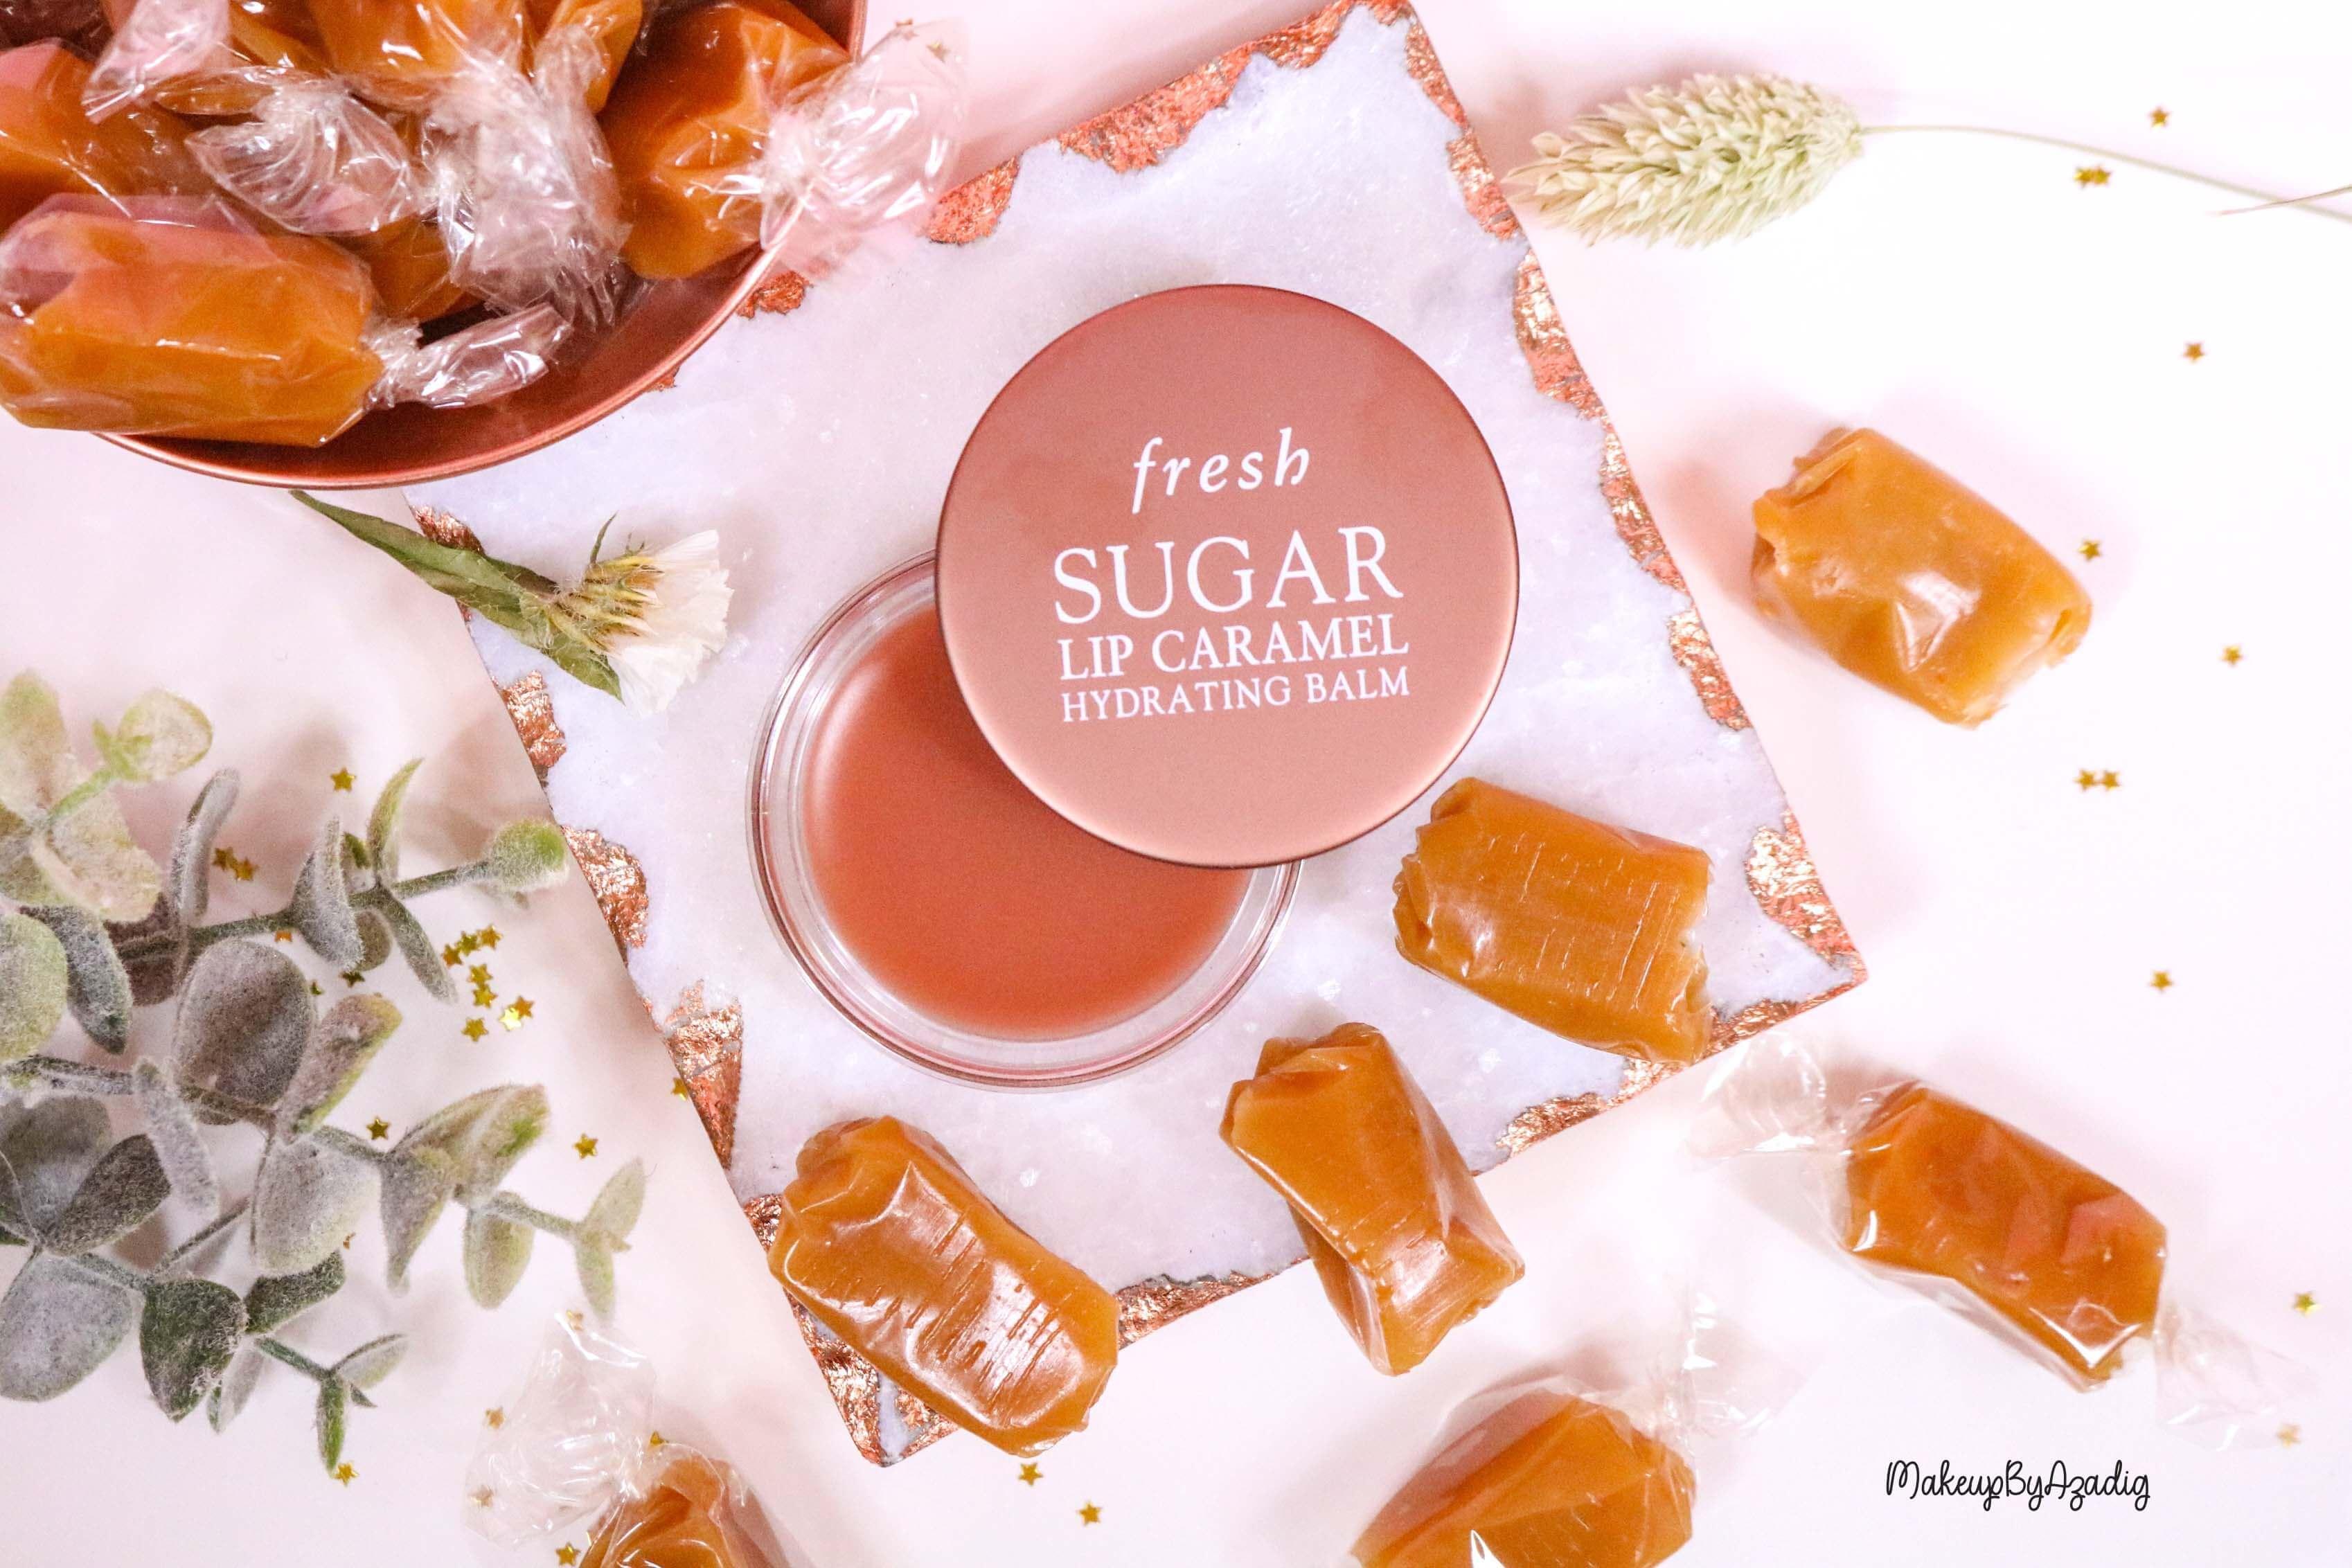 revue-baume-sucre-fresh-beauty-skincare-caramel-sugar-lip-caramel-sephora-makeupbyazadig-avis-prix-balm-miniature